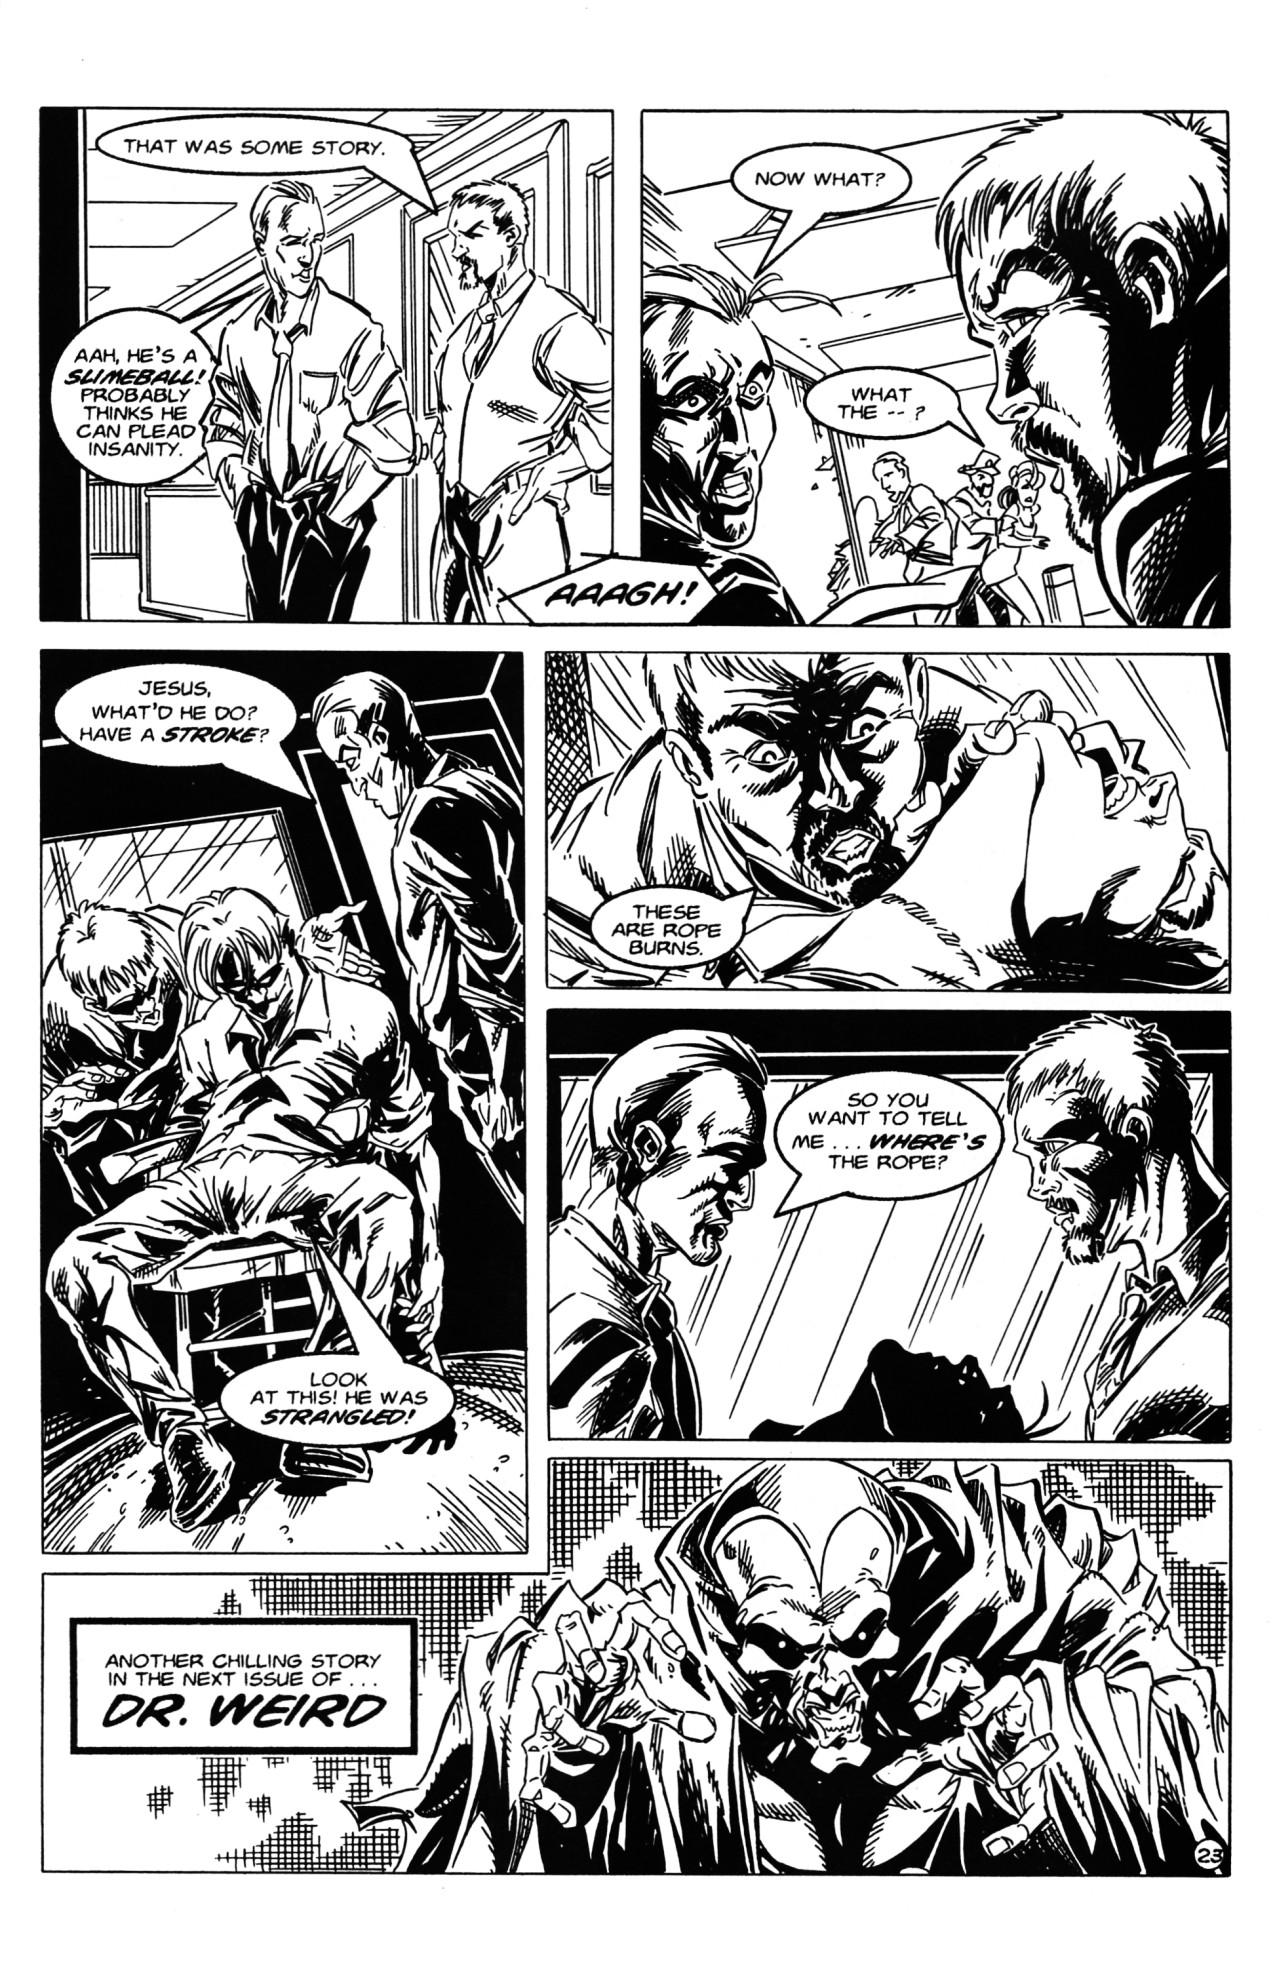 Read online Dr. Weird (1997) comic -  Issue #2 - 25